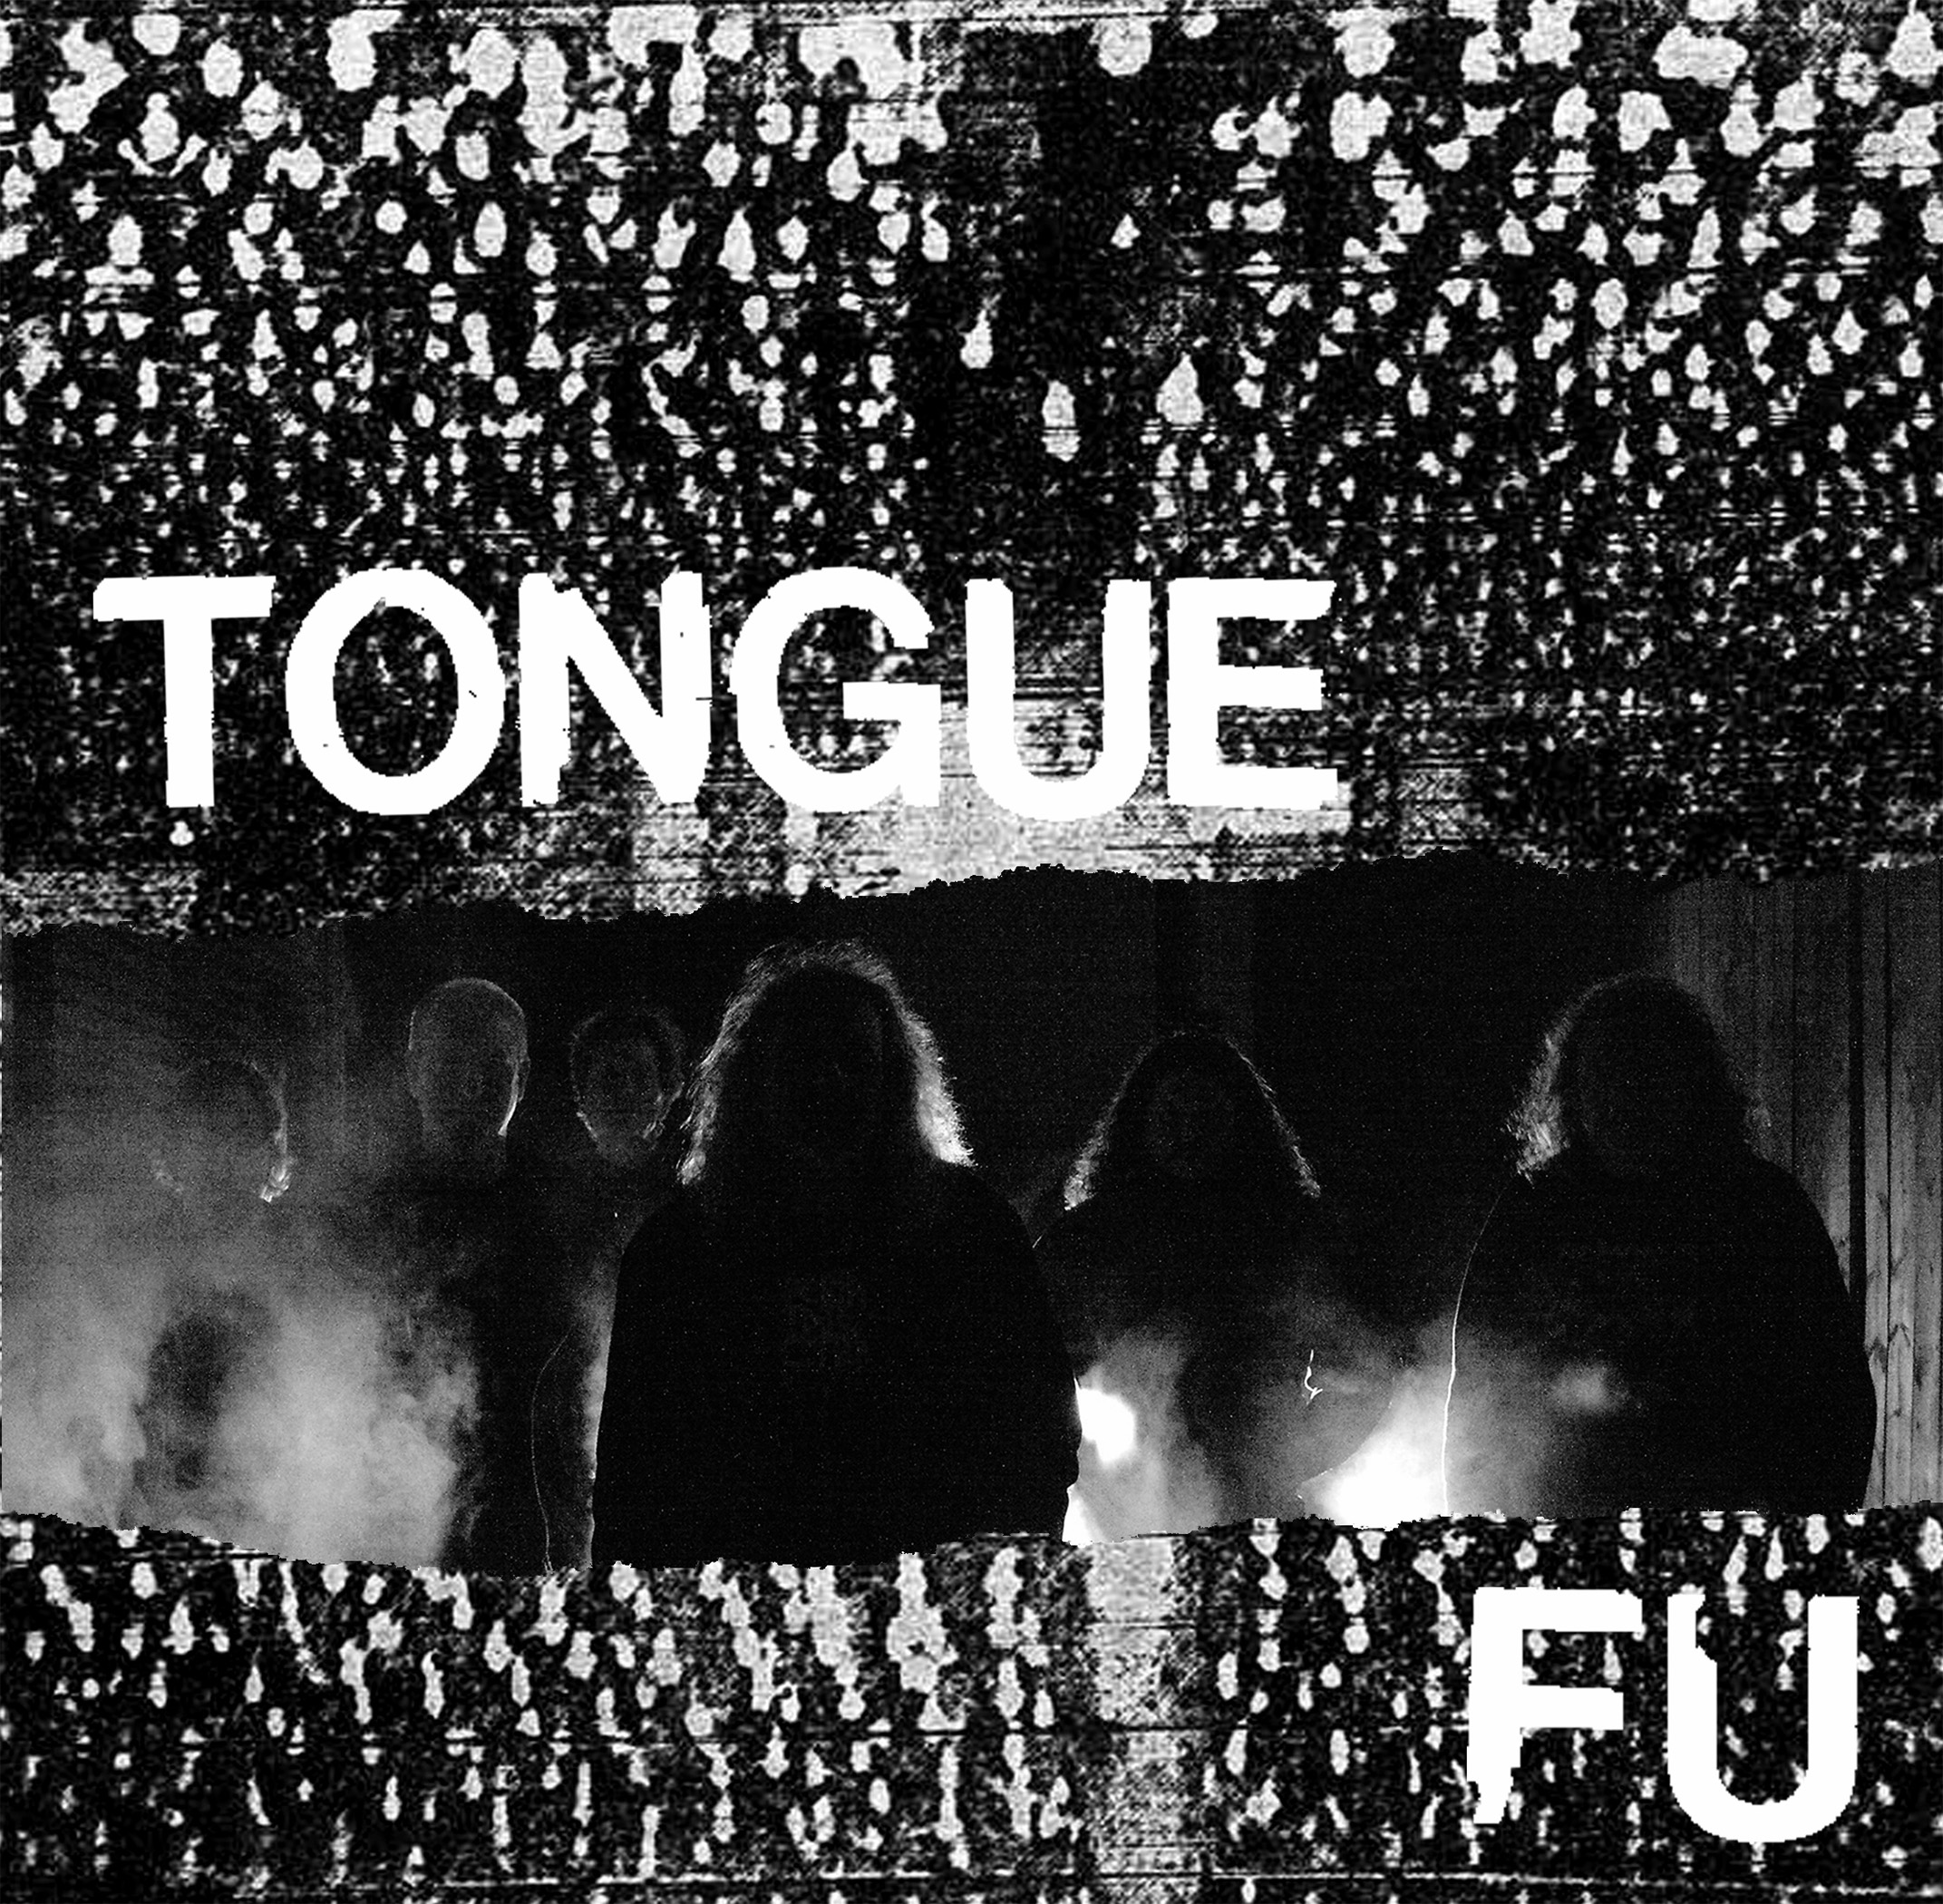 "Tongue Fu 7"" Artwork"